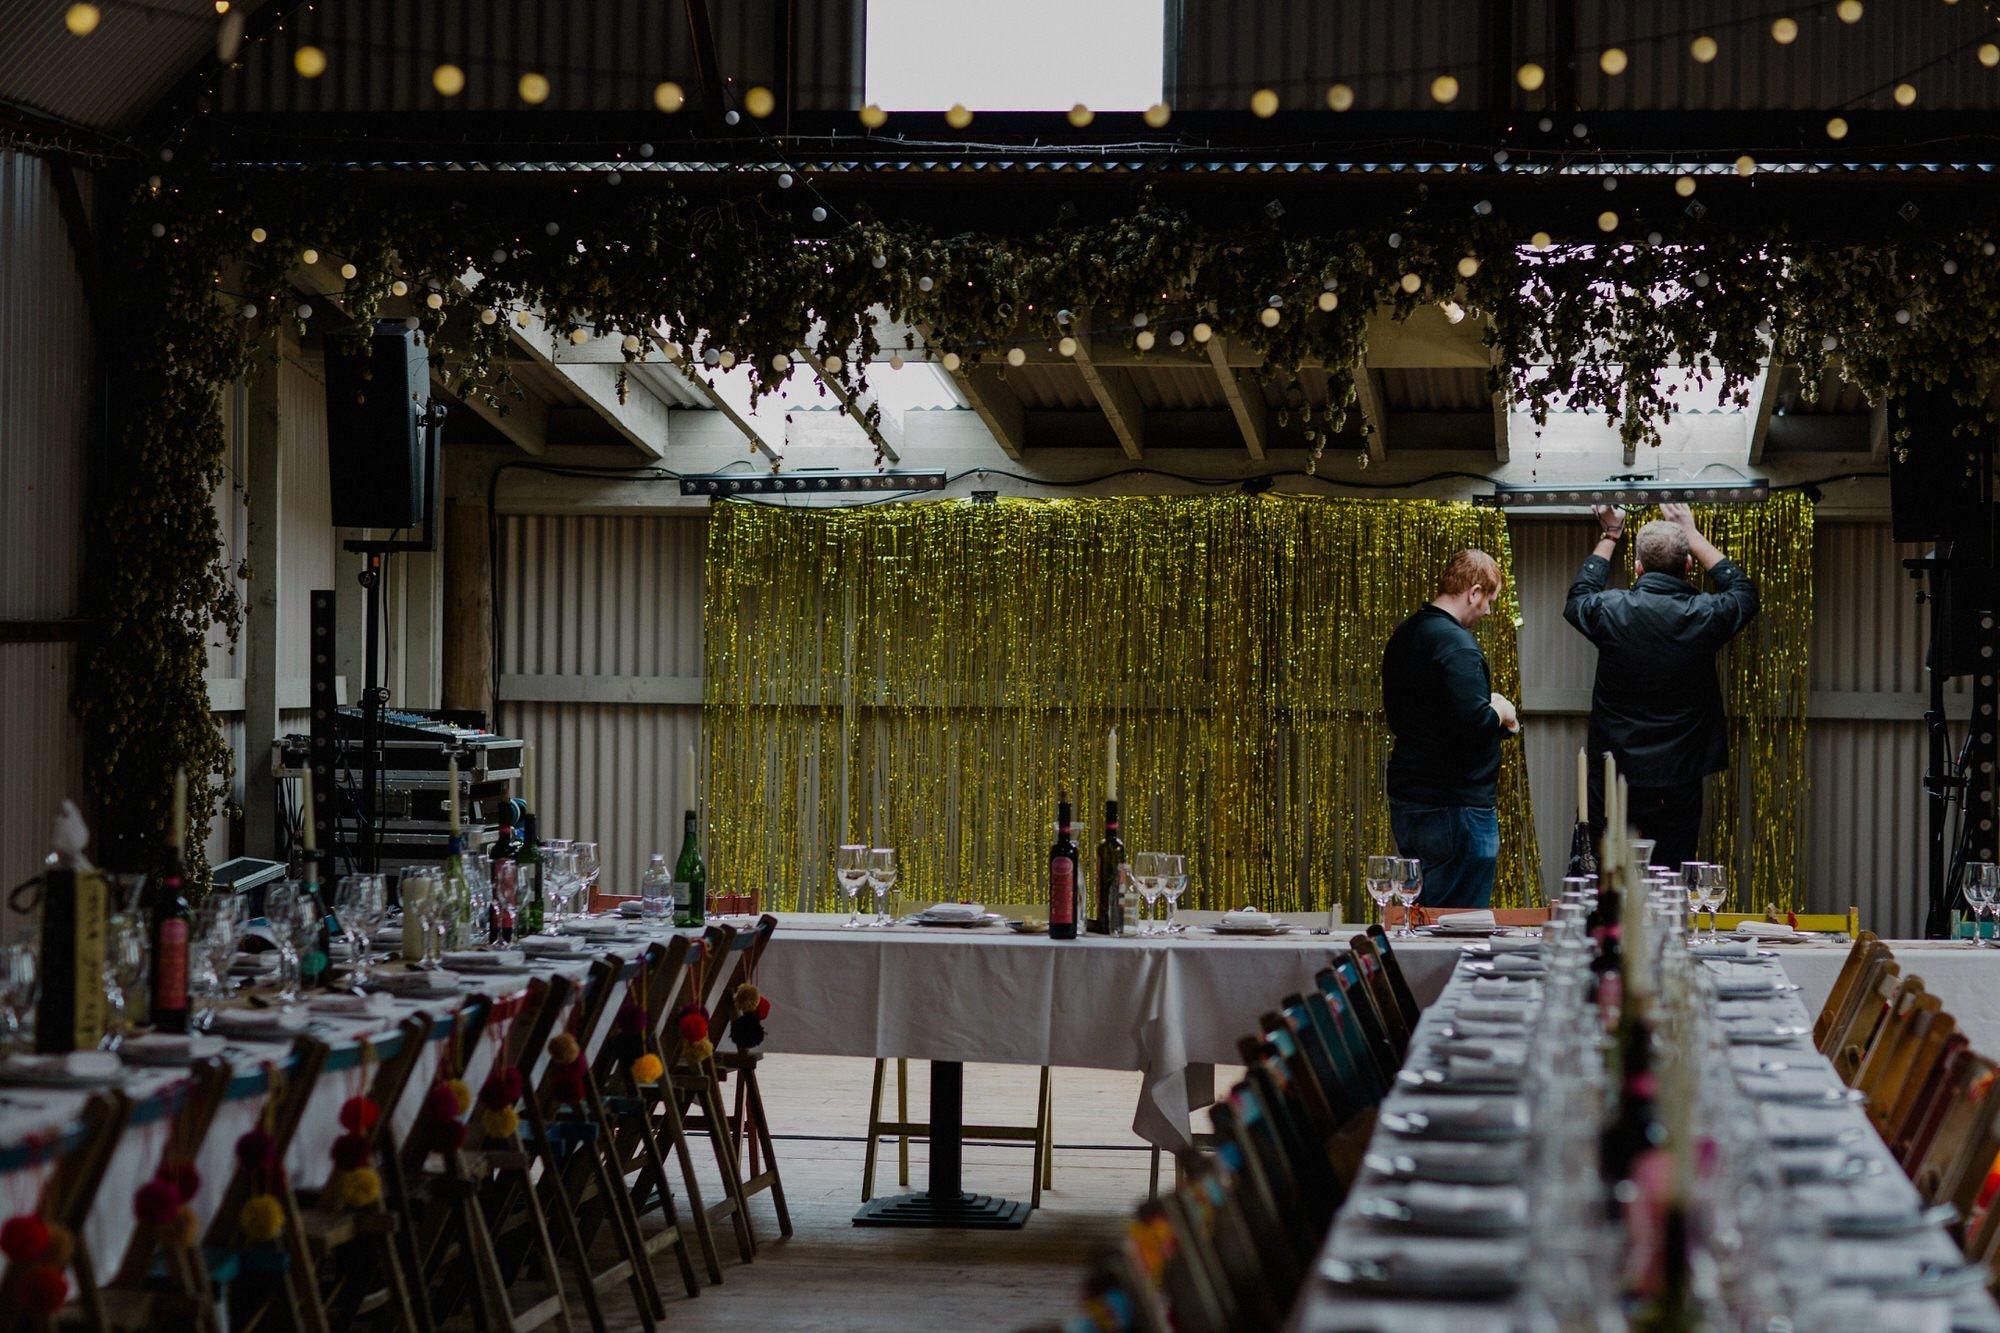 002 TIN SHED KNOCKRAICH FARM WEDDING ALTERNATIVE BRIDE ZOE ALEXANDRA PHOTOGRAPHY